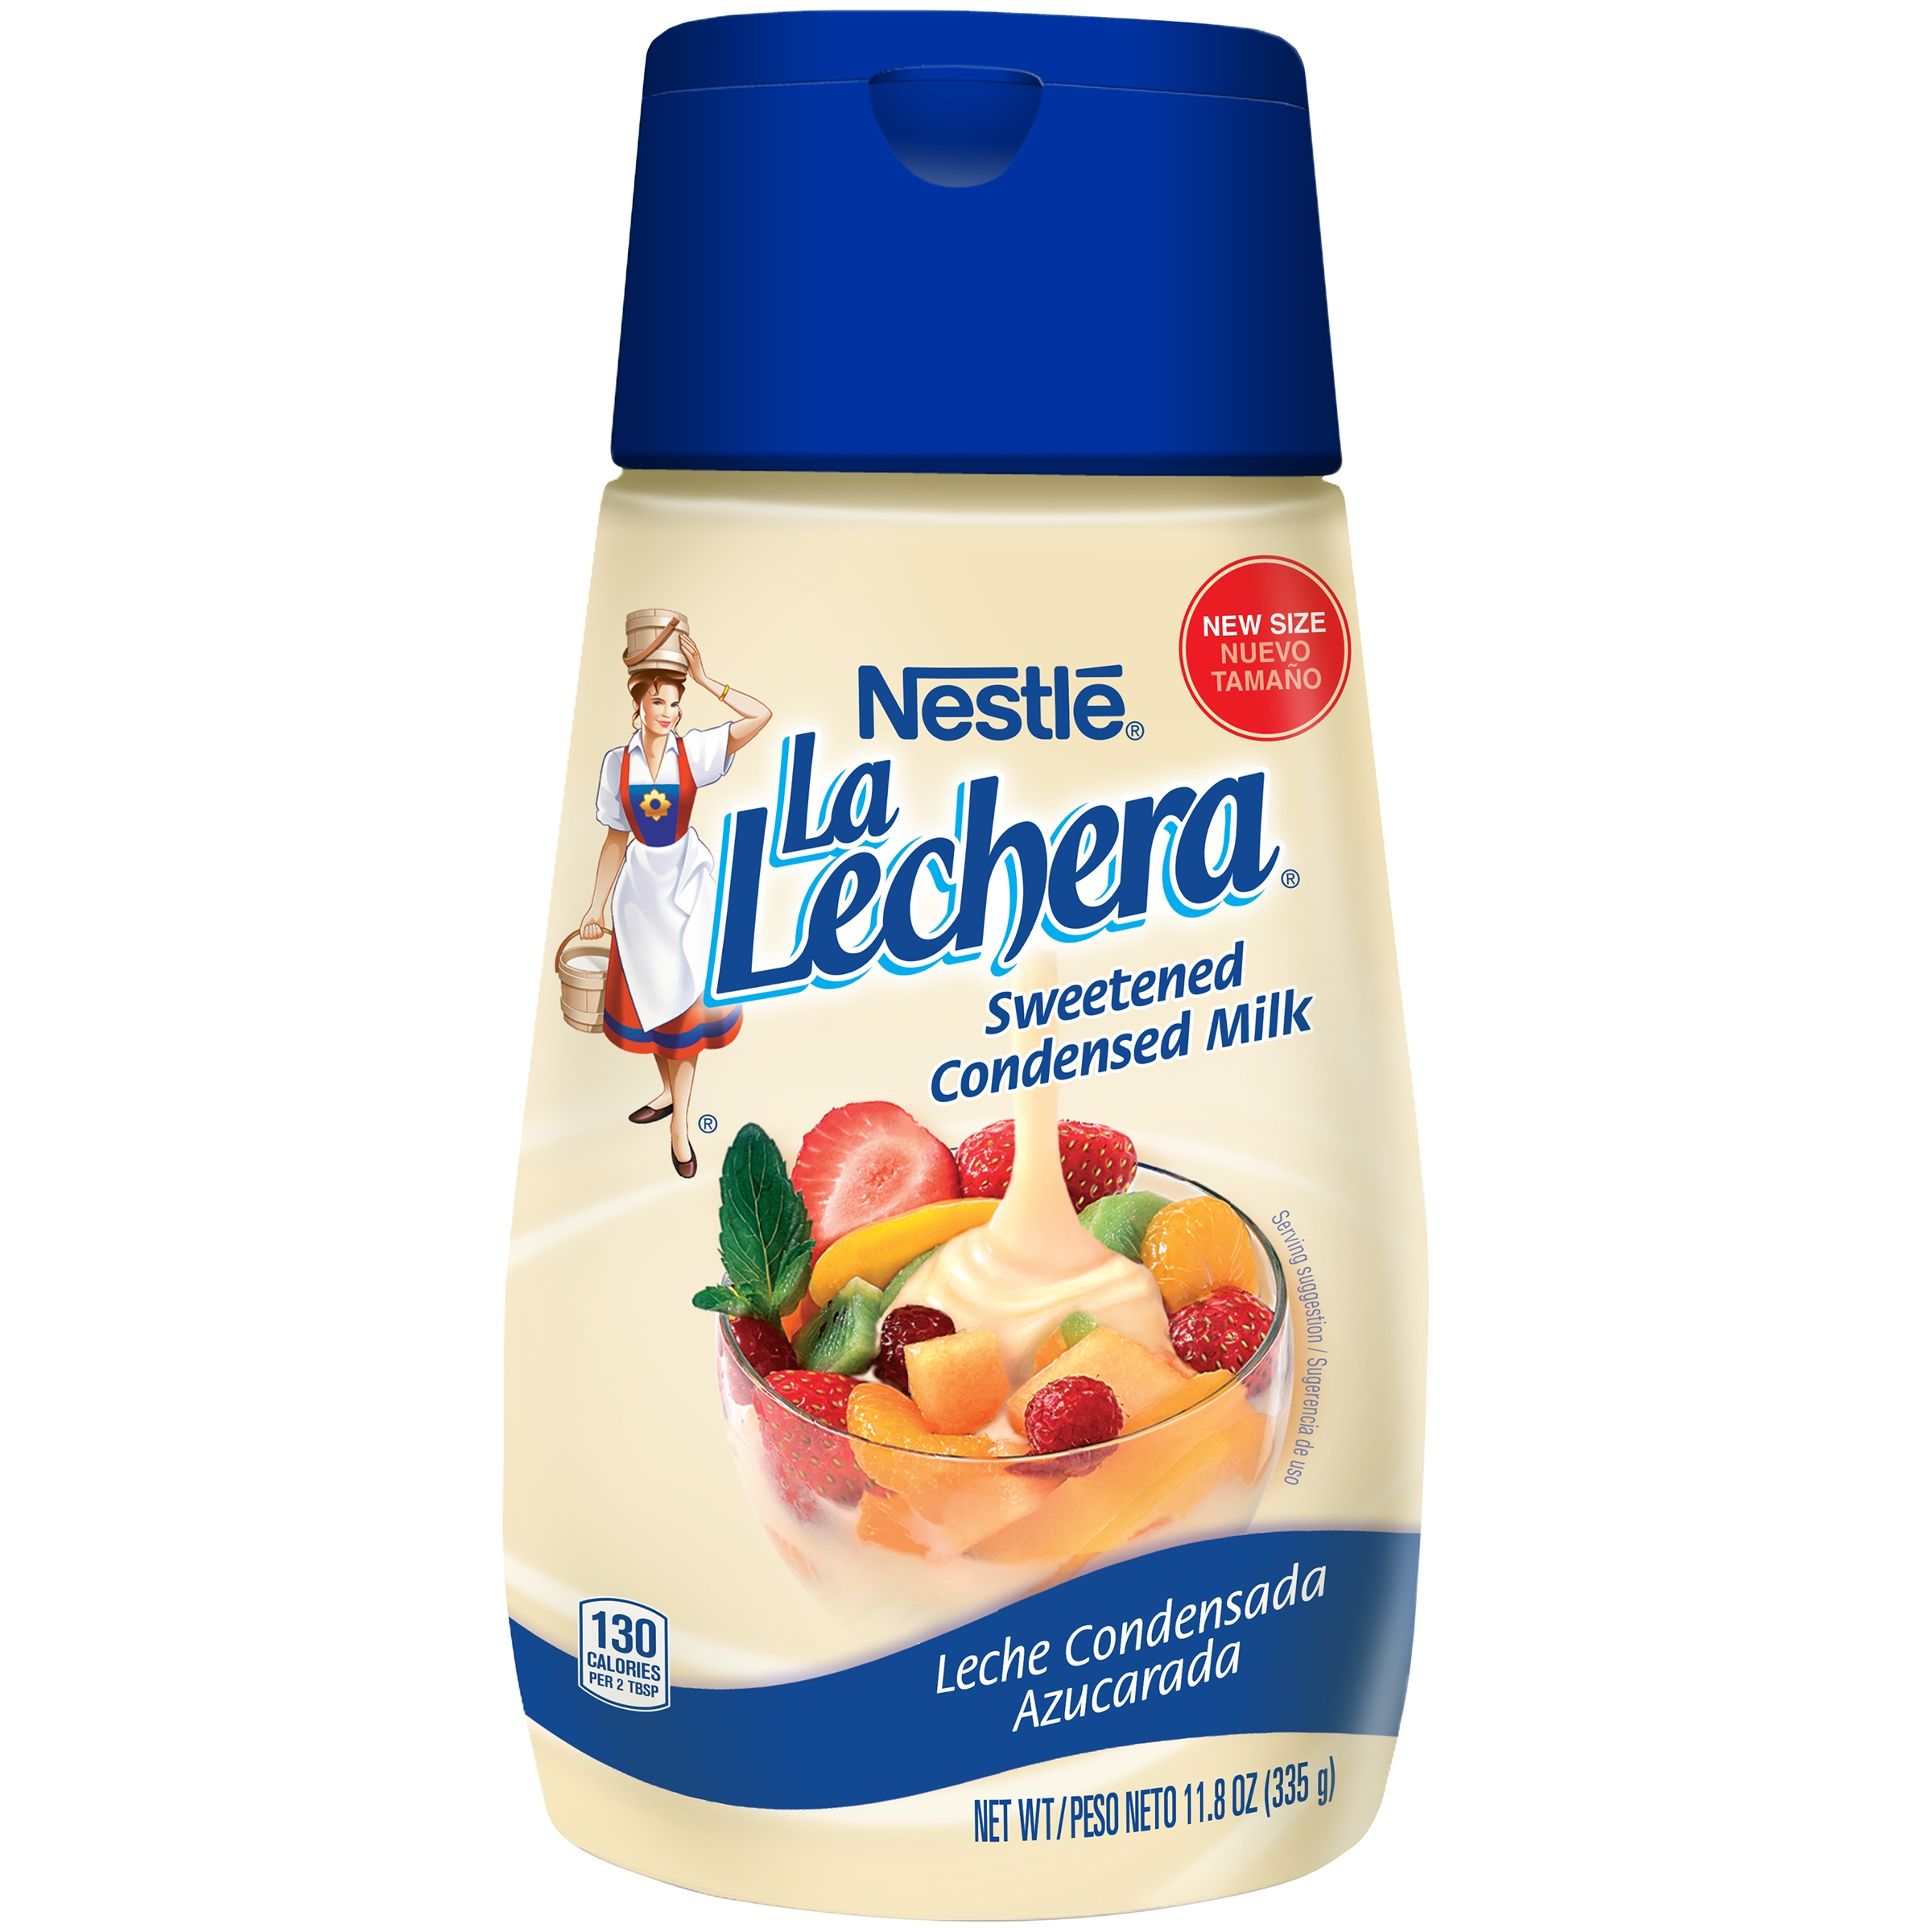 (2 Pack) LA LECHERA Sweetened Condensed Milk 11.8 oz Bottle